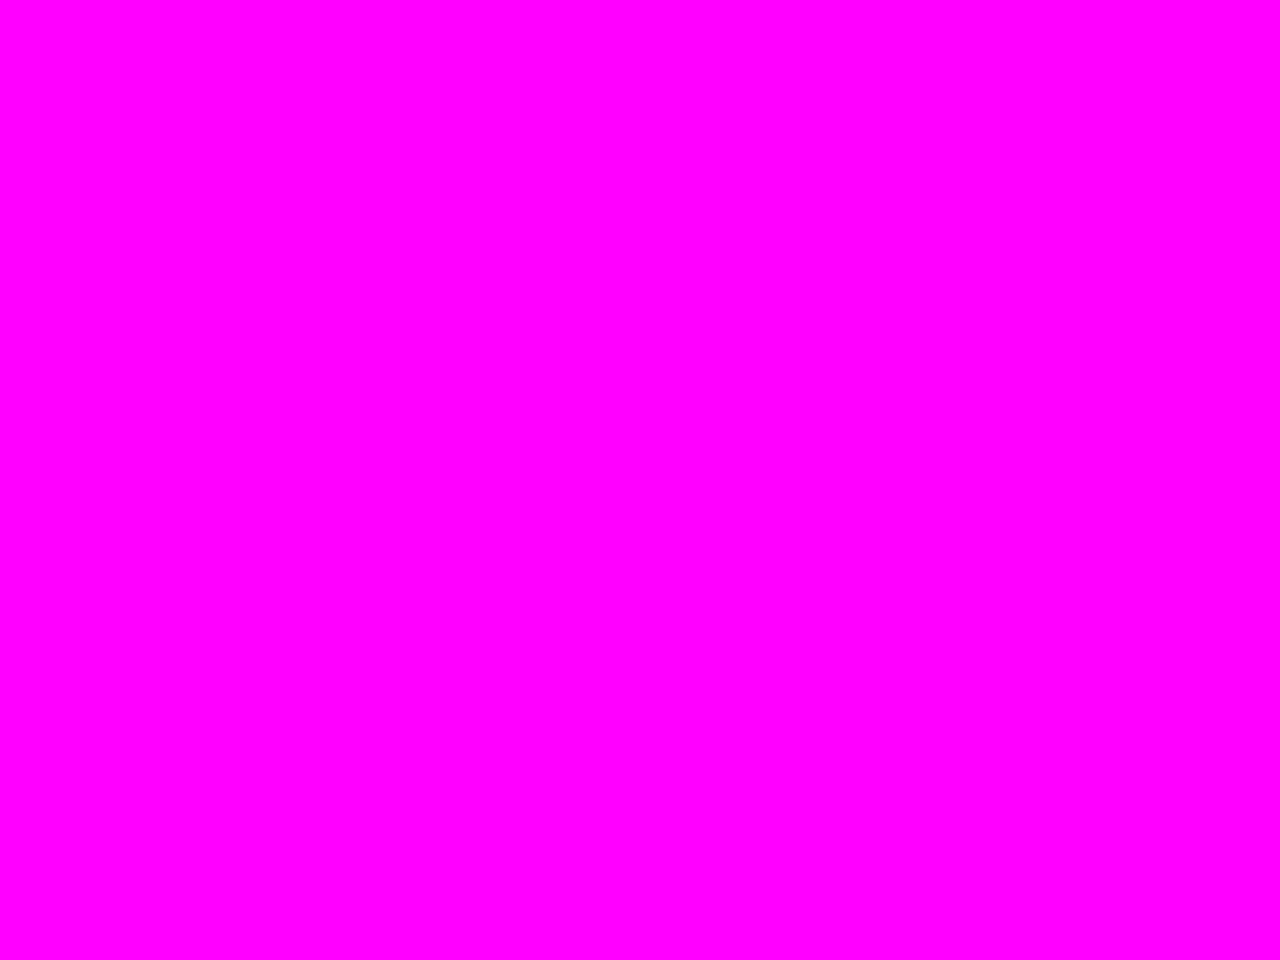 1280x960 Fuchsia Solid Color Background